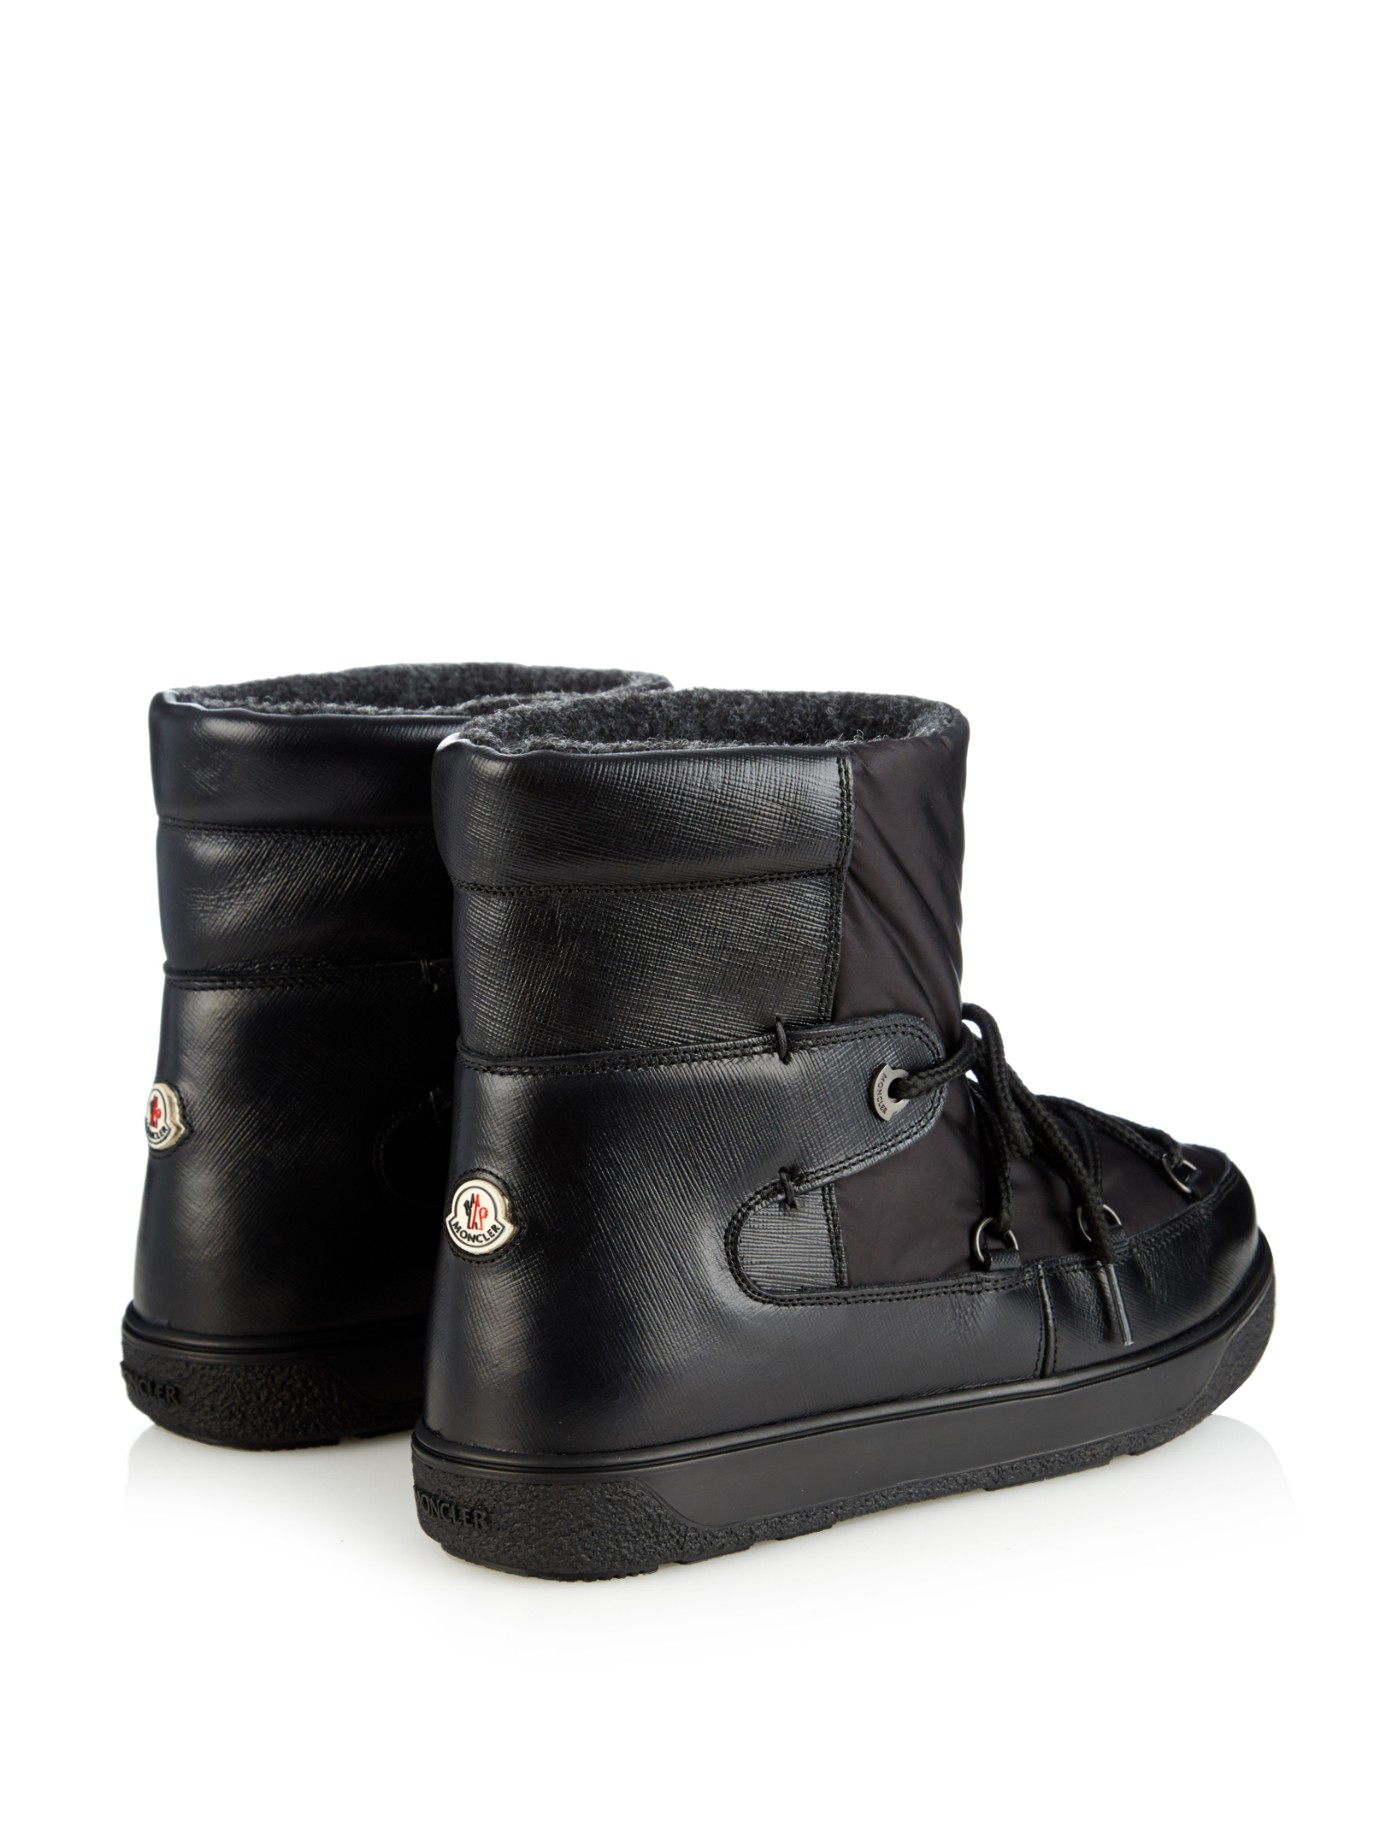 6591c9ab395a Boots Lyst Fanny Black Ski In Aprés Moncler qSqfR at sexuality.visa ...